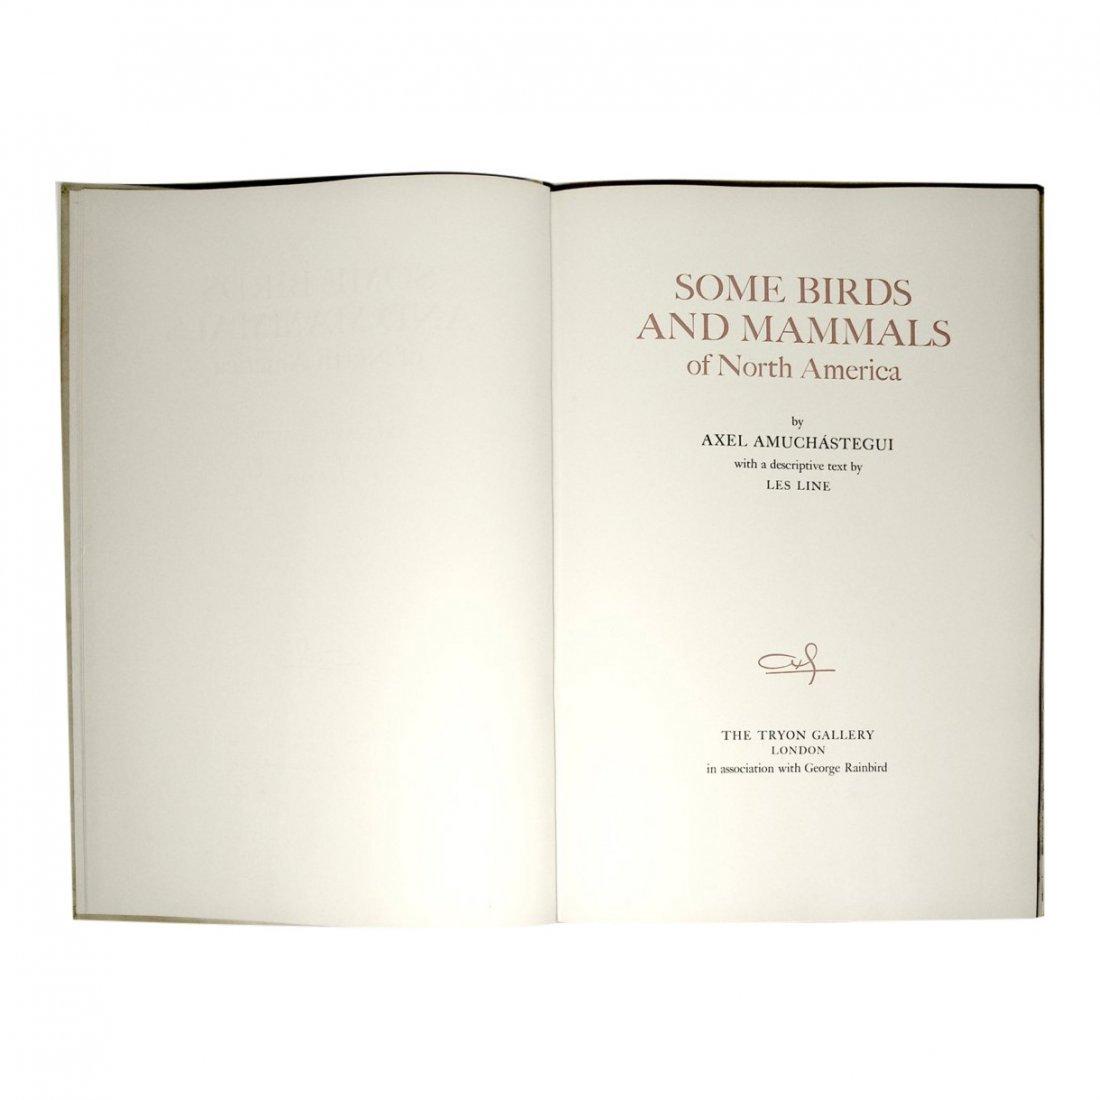 Some Birds & Mammals of N. America by Axel Amuchastegui